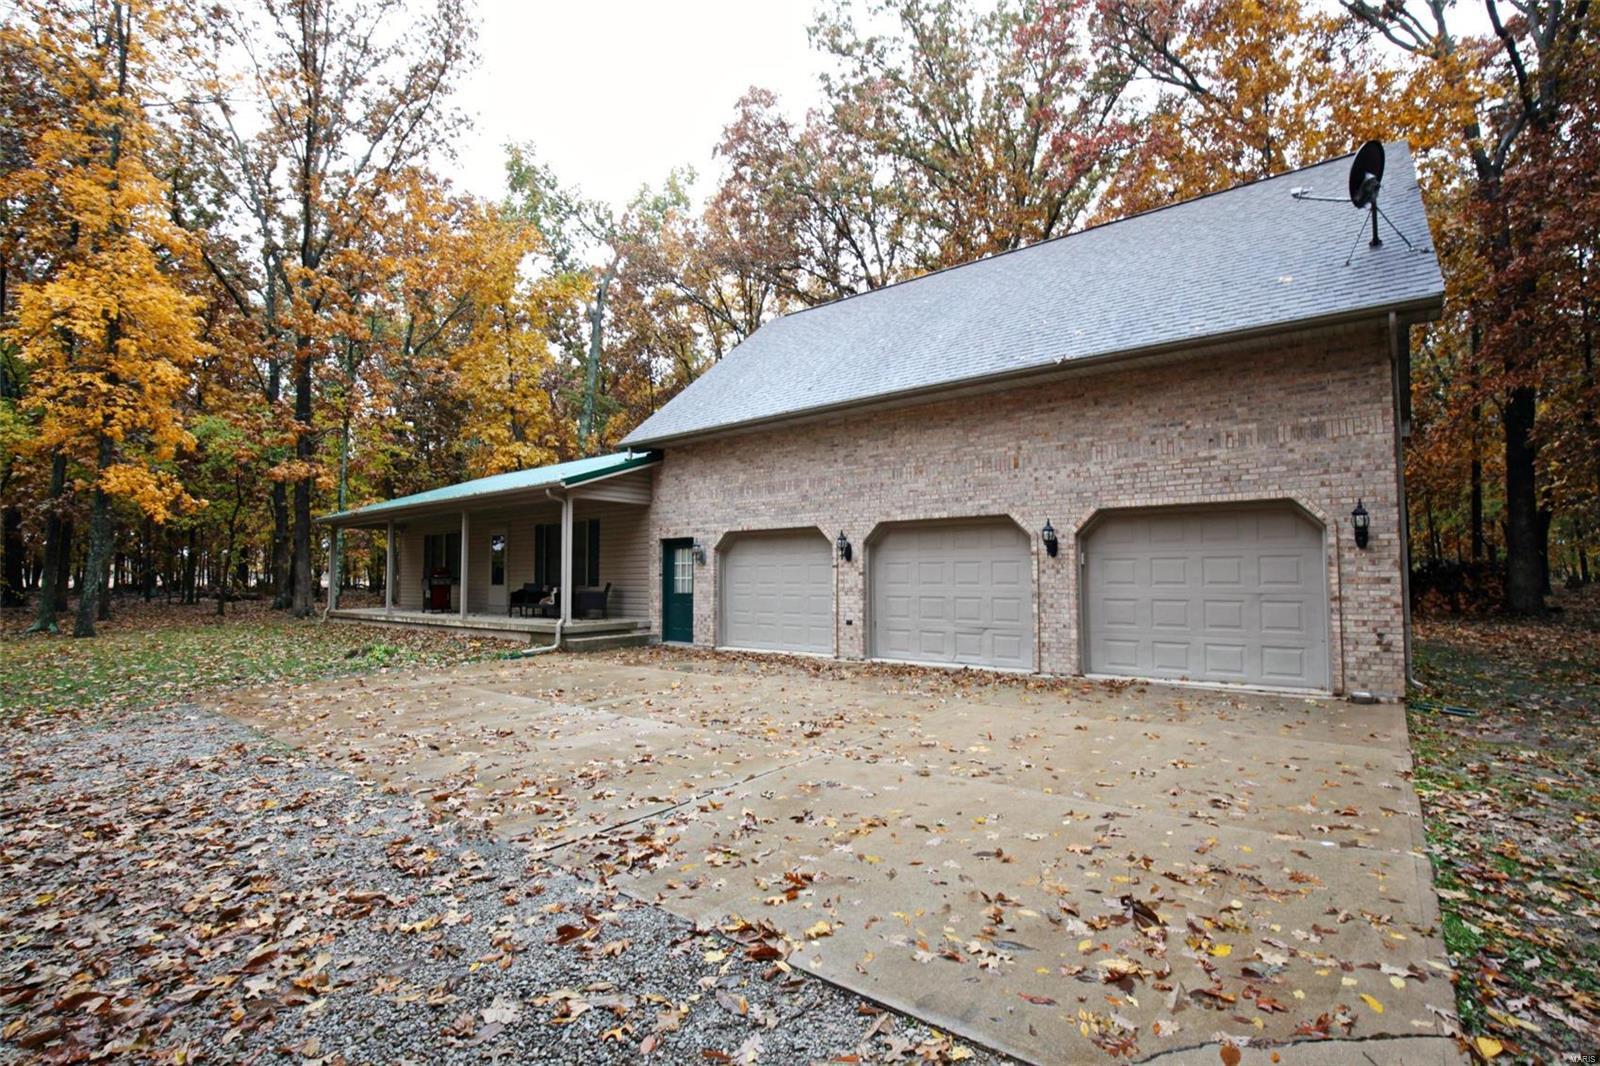 1219 E. 1400 Avenue Property Photo - Vandalia, IL real estate listing